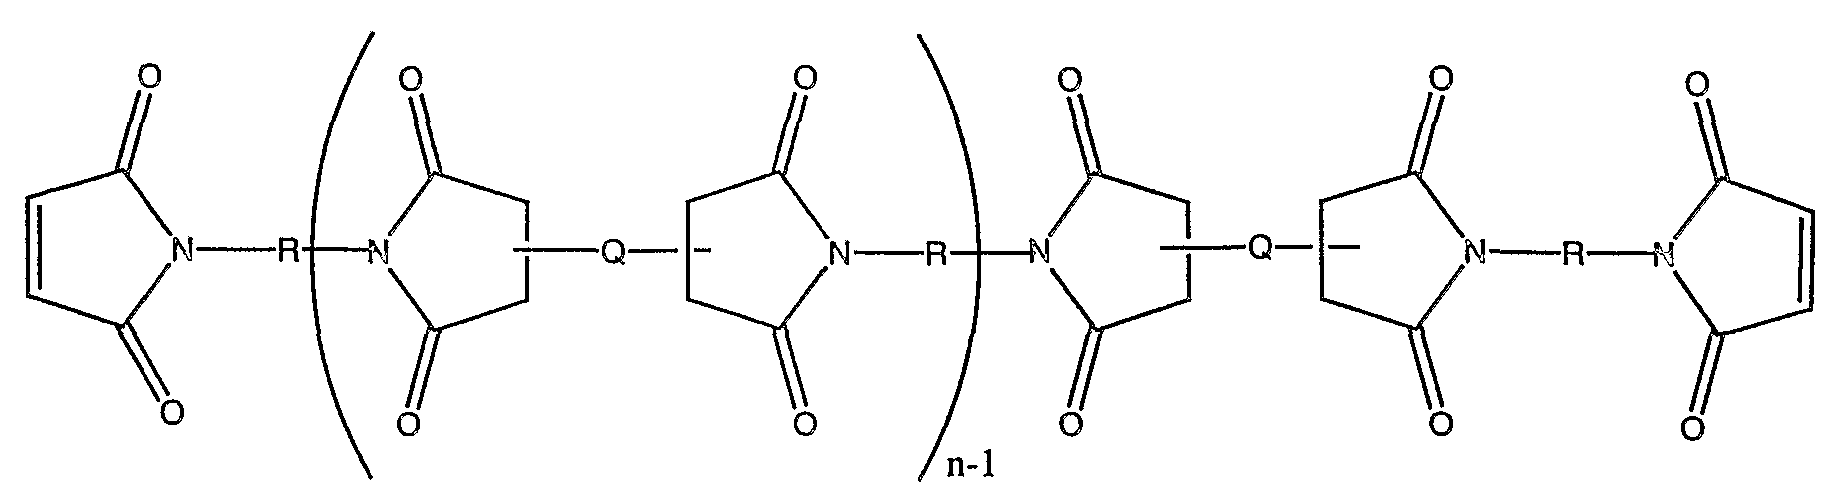 Figure 712012001435804-pct00023